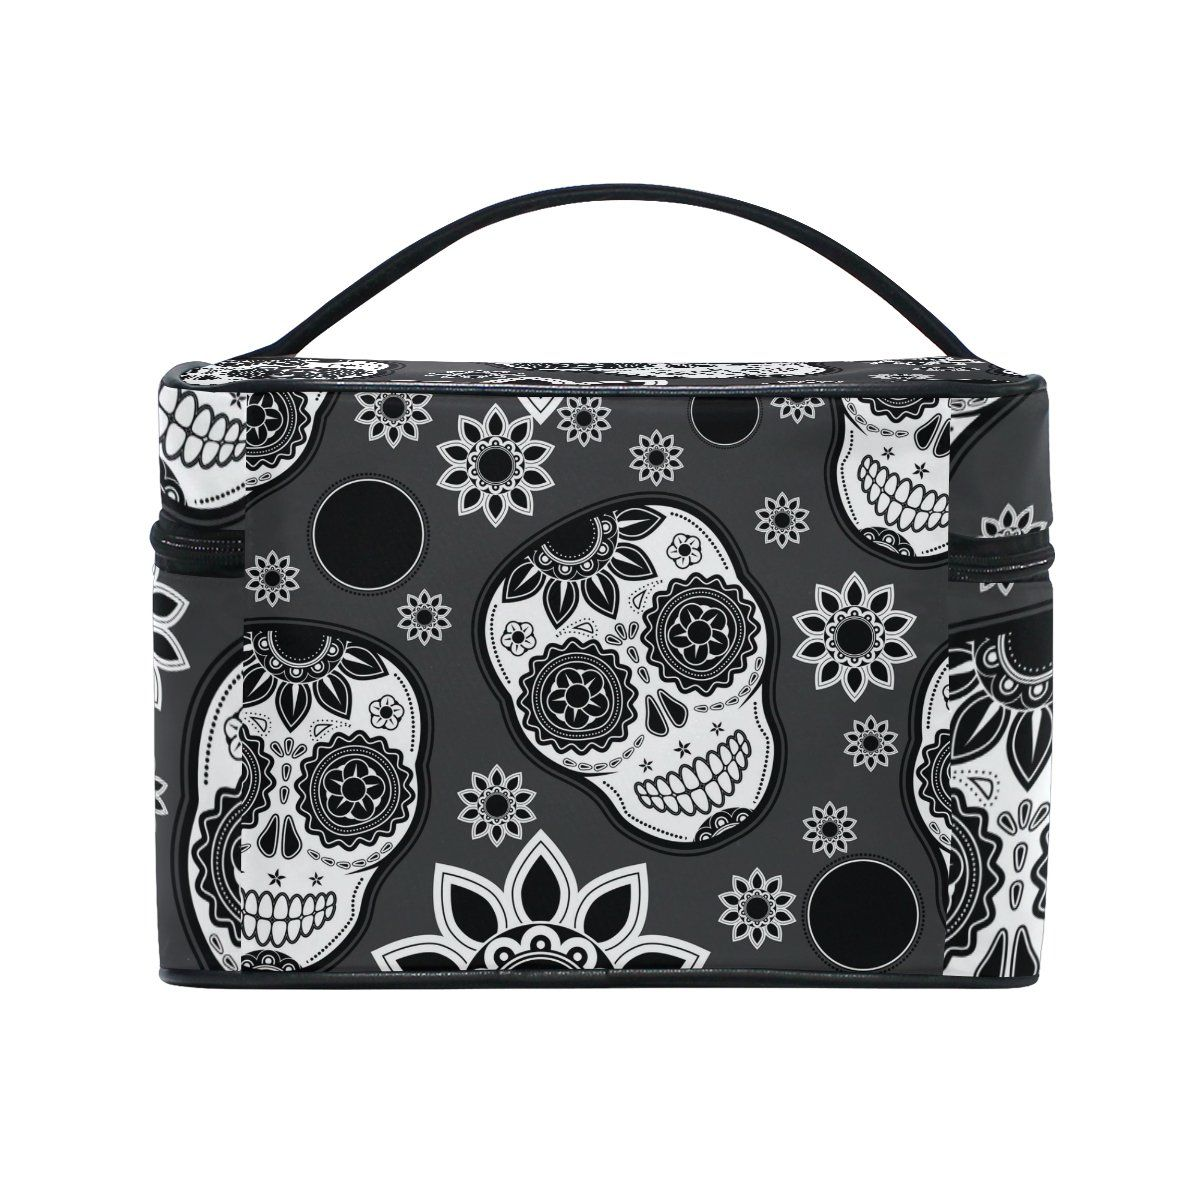 KUWT Sugar Skull Women Travel Makeup Bag Portable Cosmetic